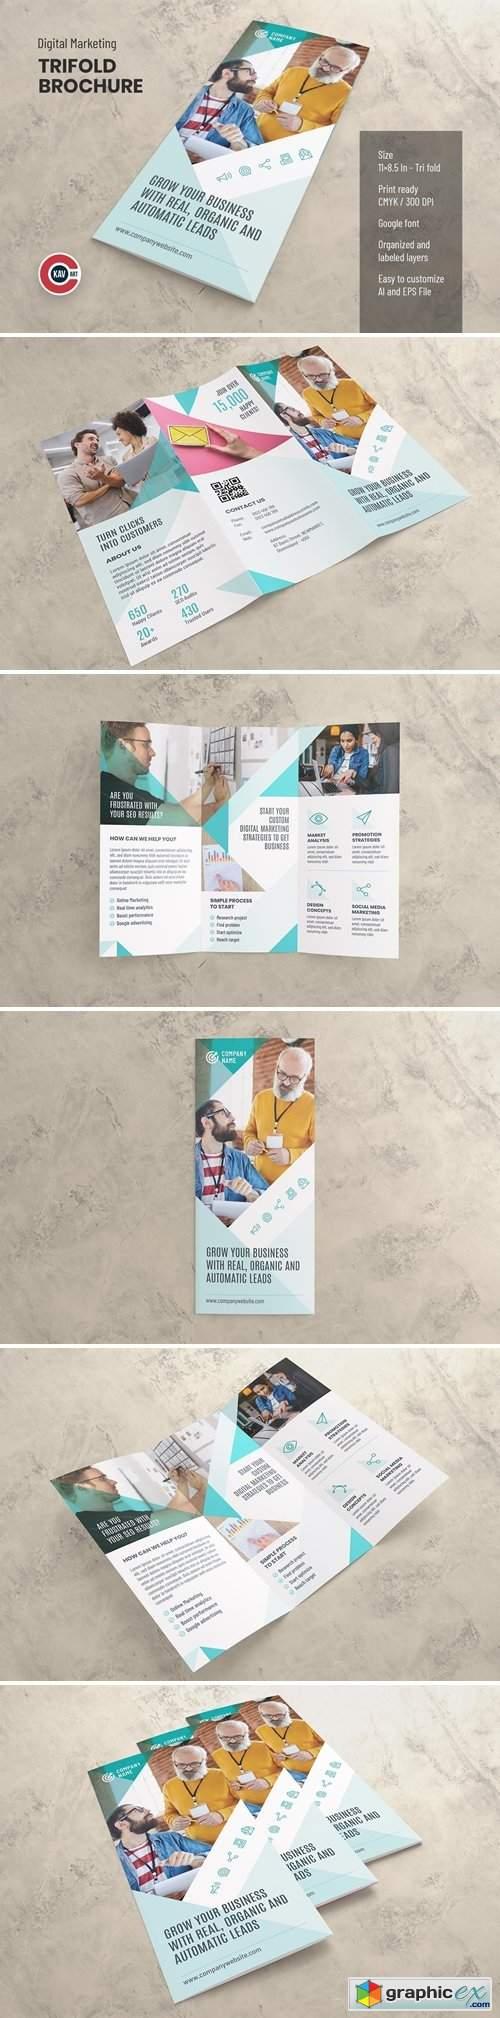 Trifold Brochure Template - Vol. 01